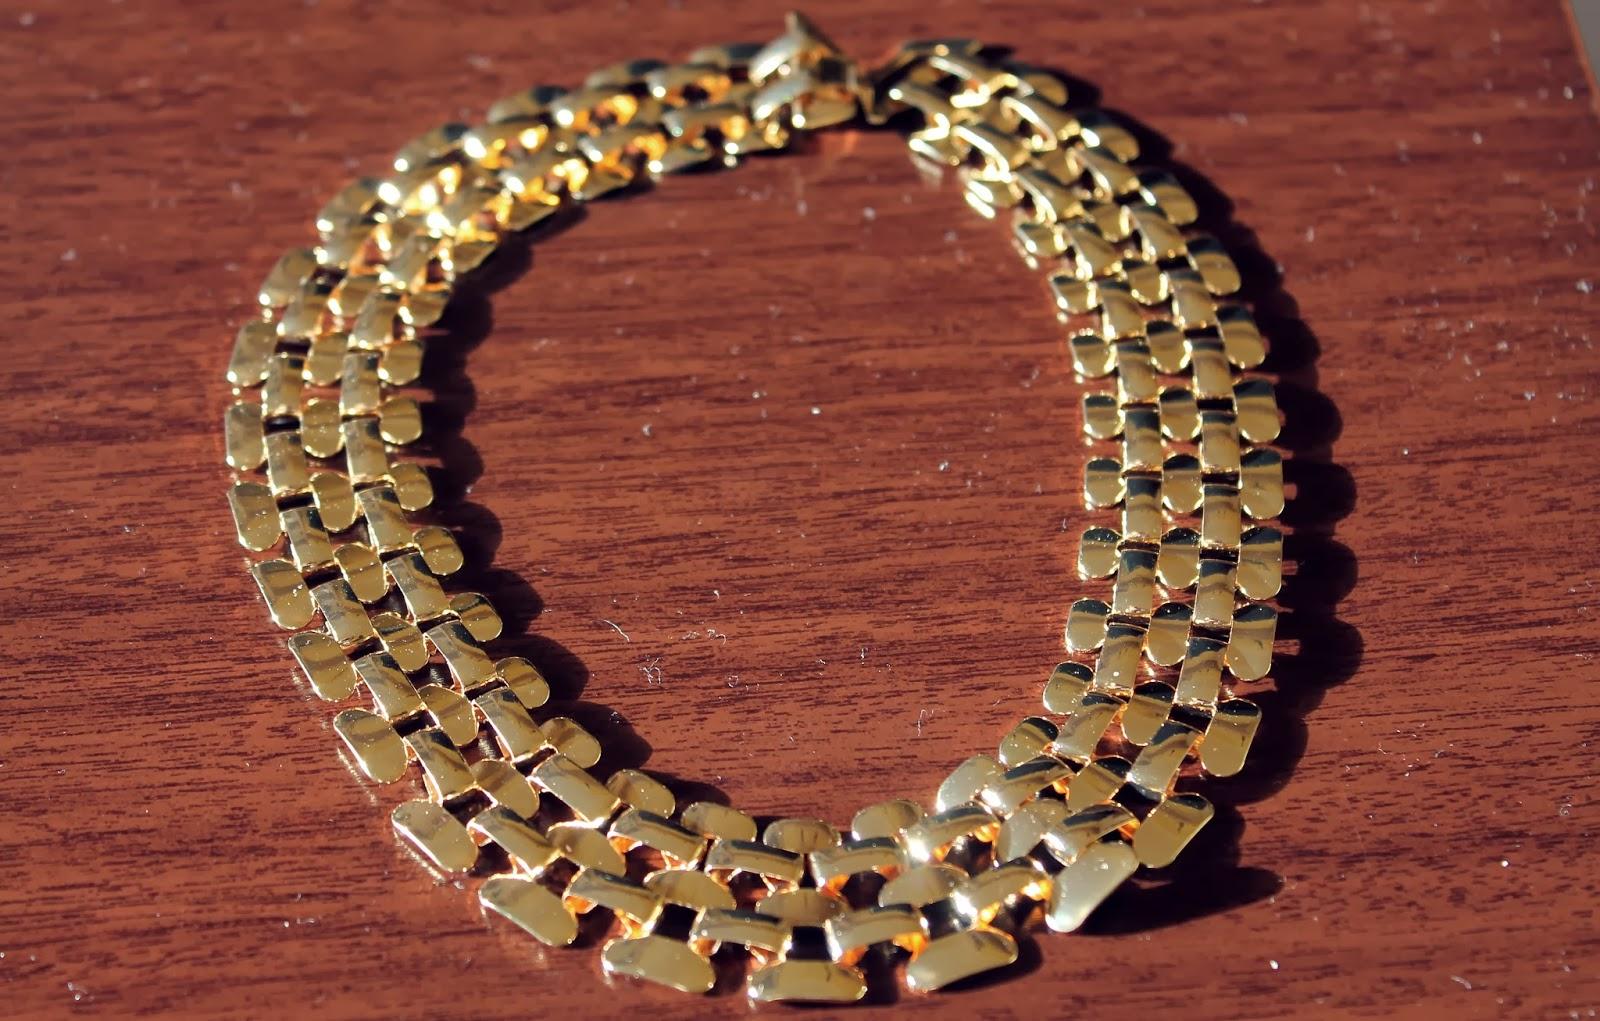 http://www.romwe.com/ROMWE-Hollow-out-Wide-Golden-Necklace%287.9900%29-p-78140.html?xoxoentresaias